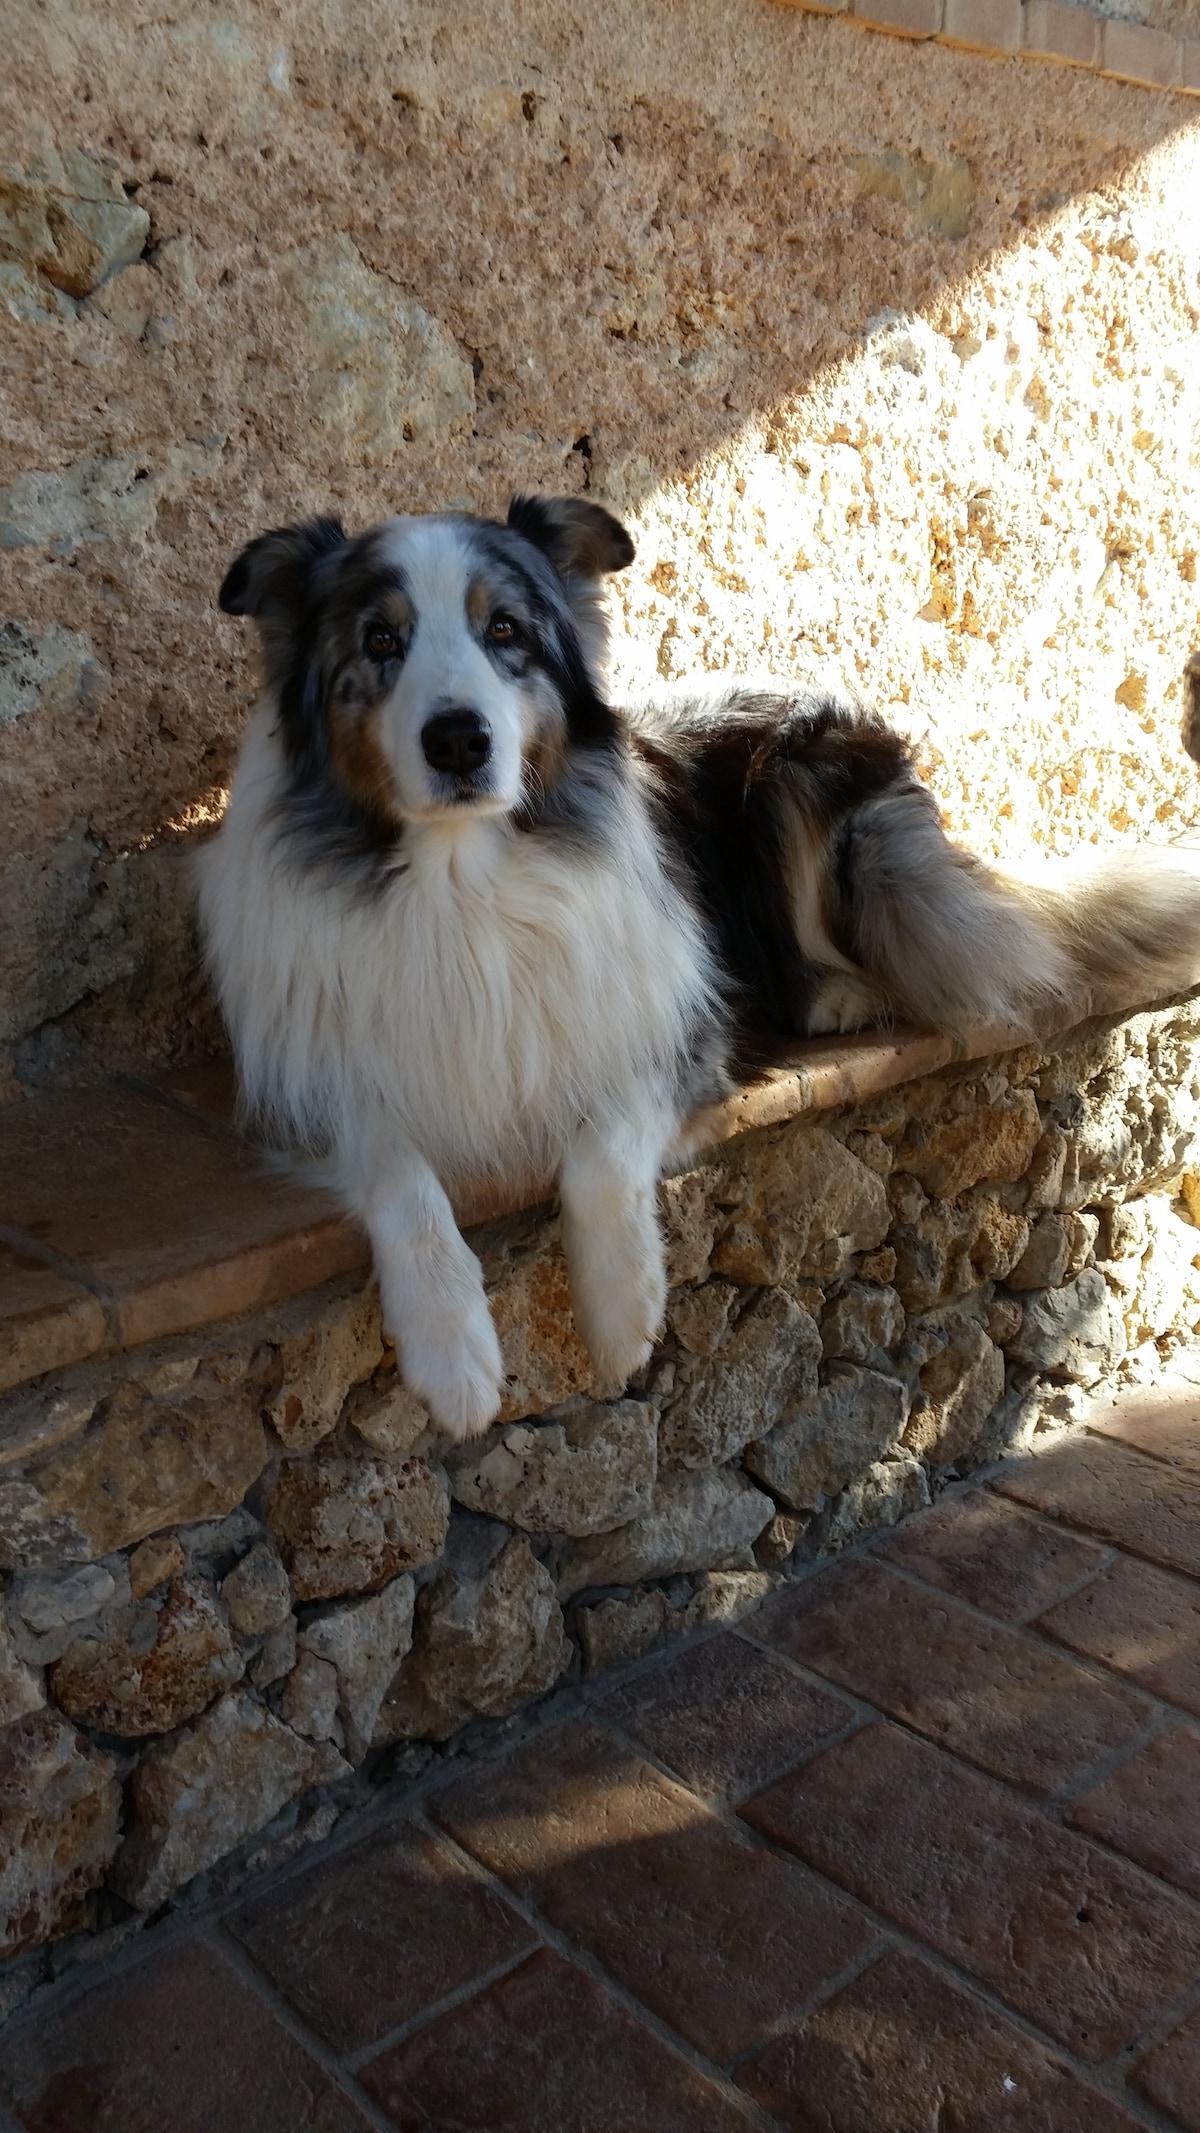 Ilaria from Santa Lucia